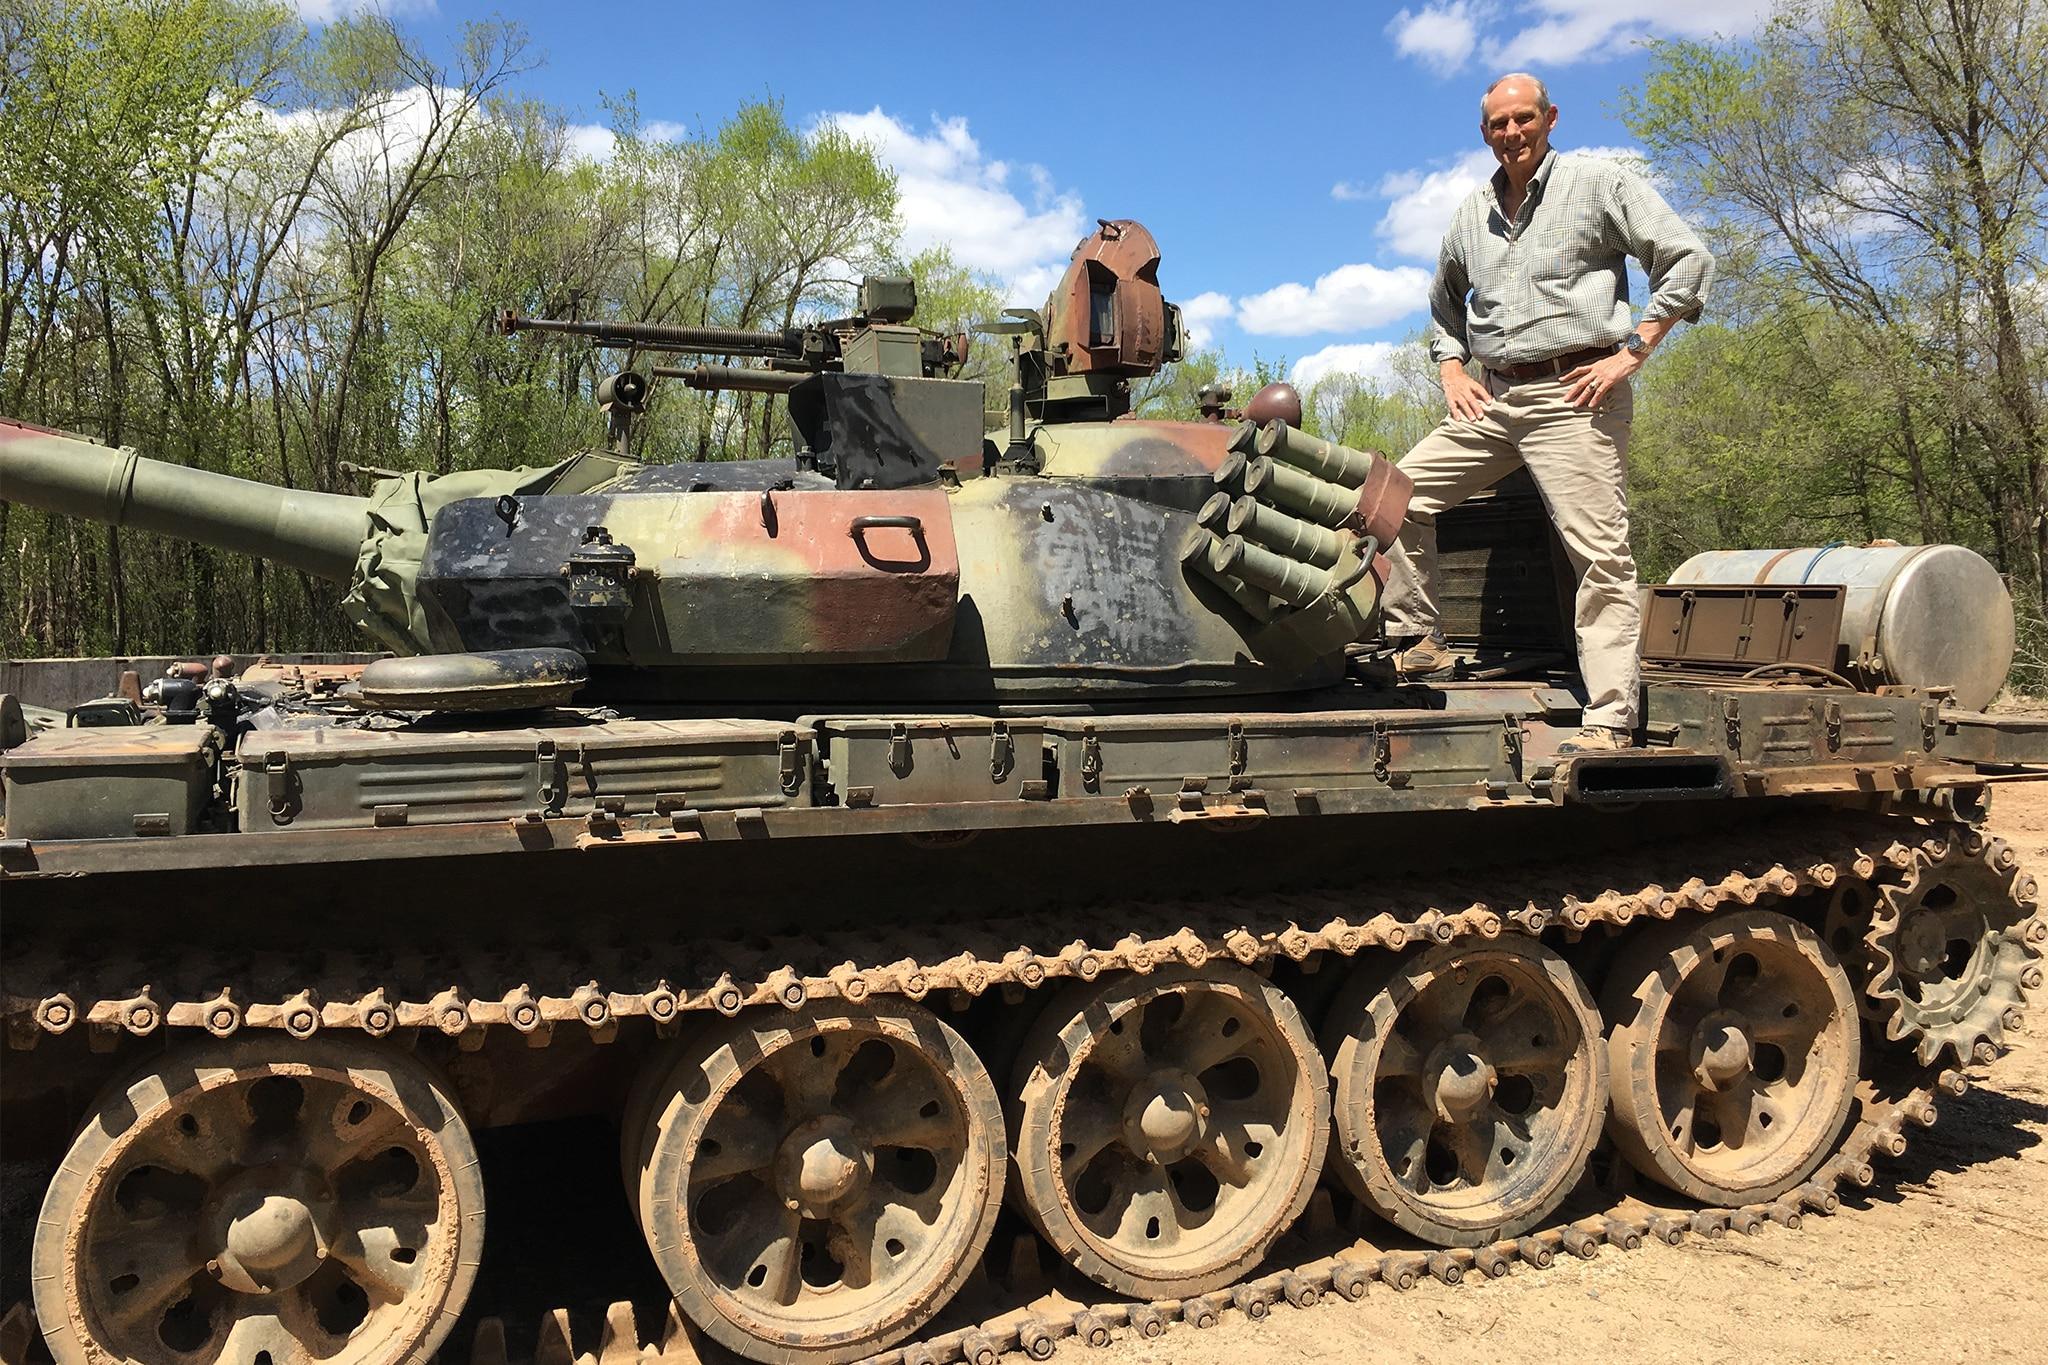 tank drive era sherman wwii stripes start earning magazine packages call visit information